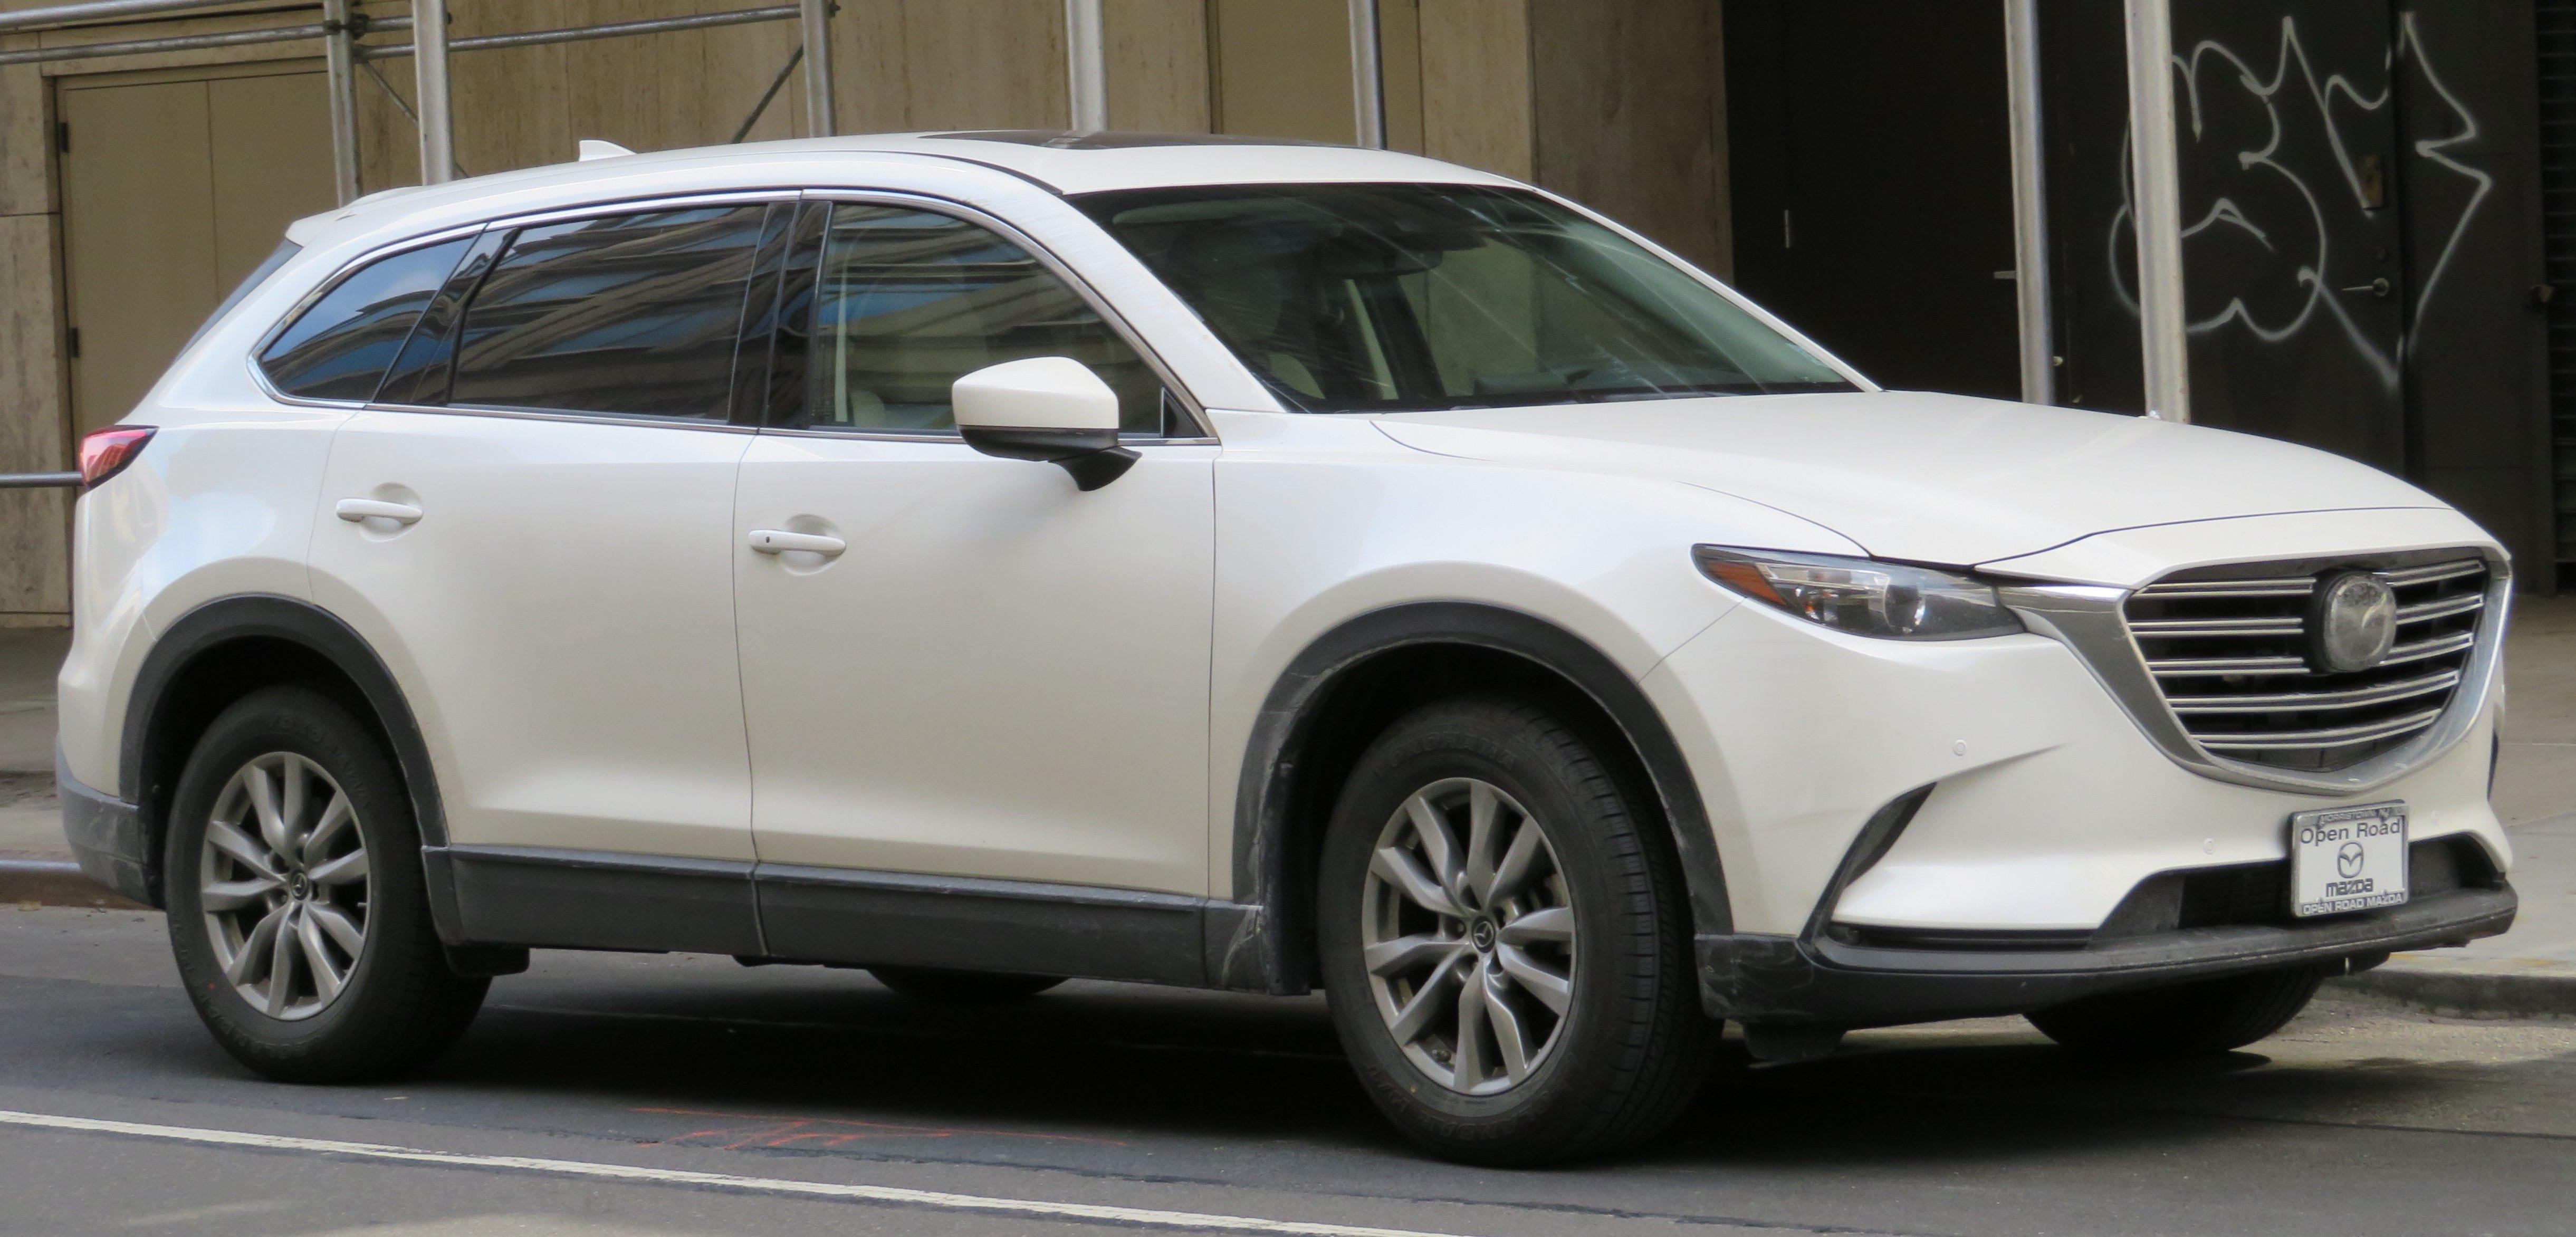 Mazda Cx 9 >> Mazda Cx 9 Wikipedia